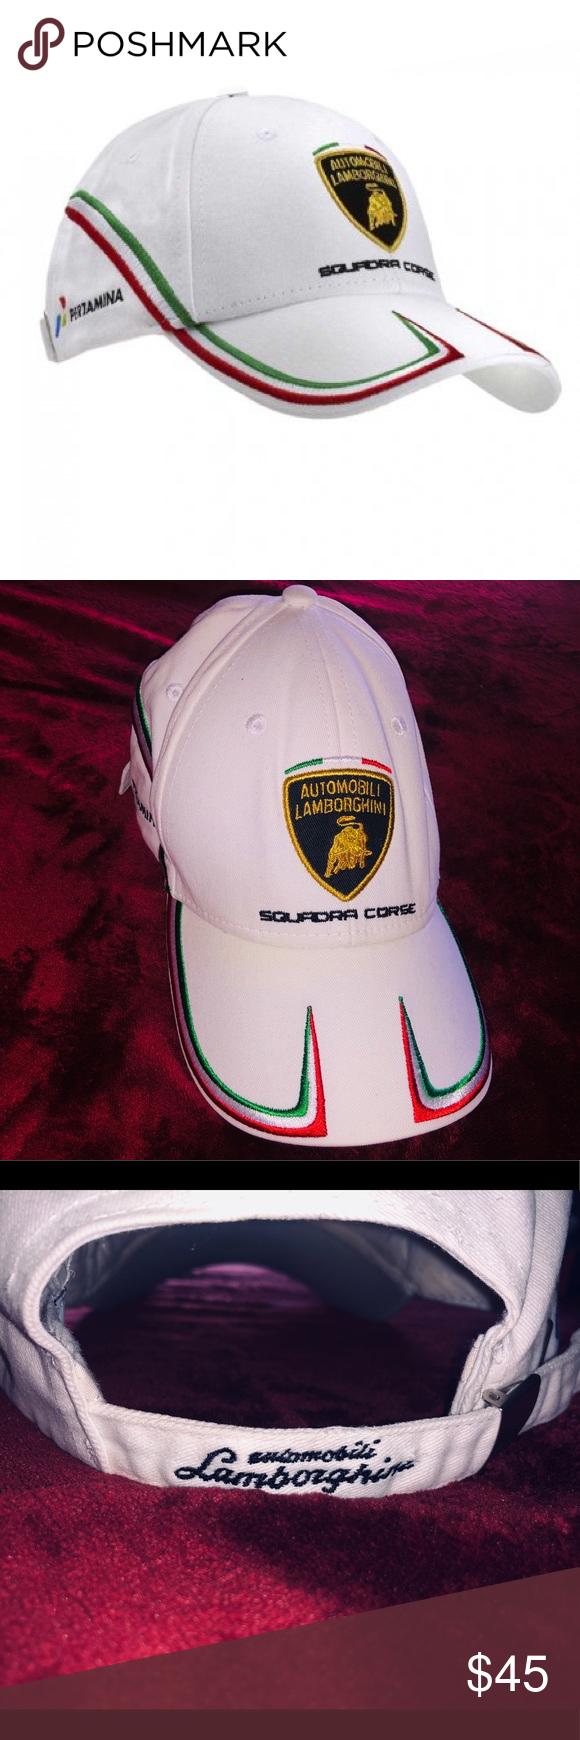 Lamborghini Squadra Corse Hat White, with red white and green stripes embroidered on the hat. Authentic automobili Lamborghini product. 100% cotton. Currently sold out on Amazon. Lamborghini Accessories Hats